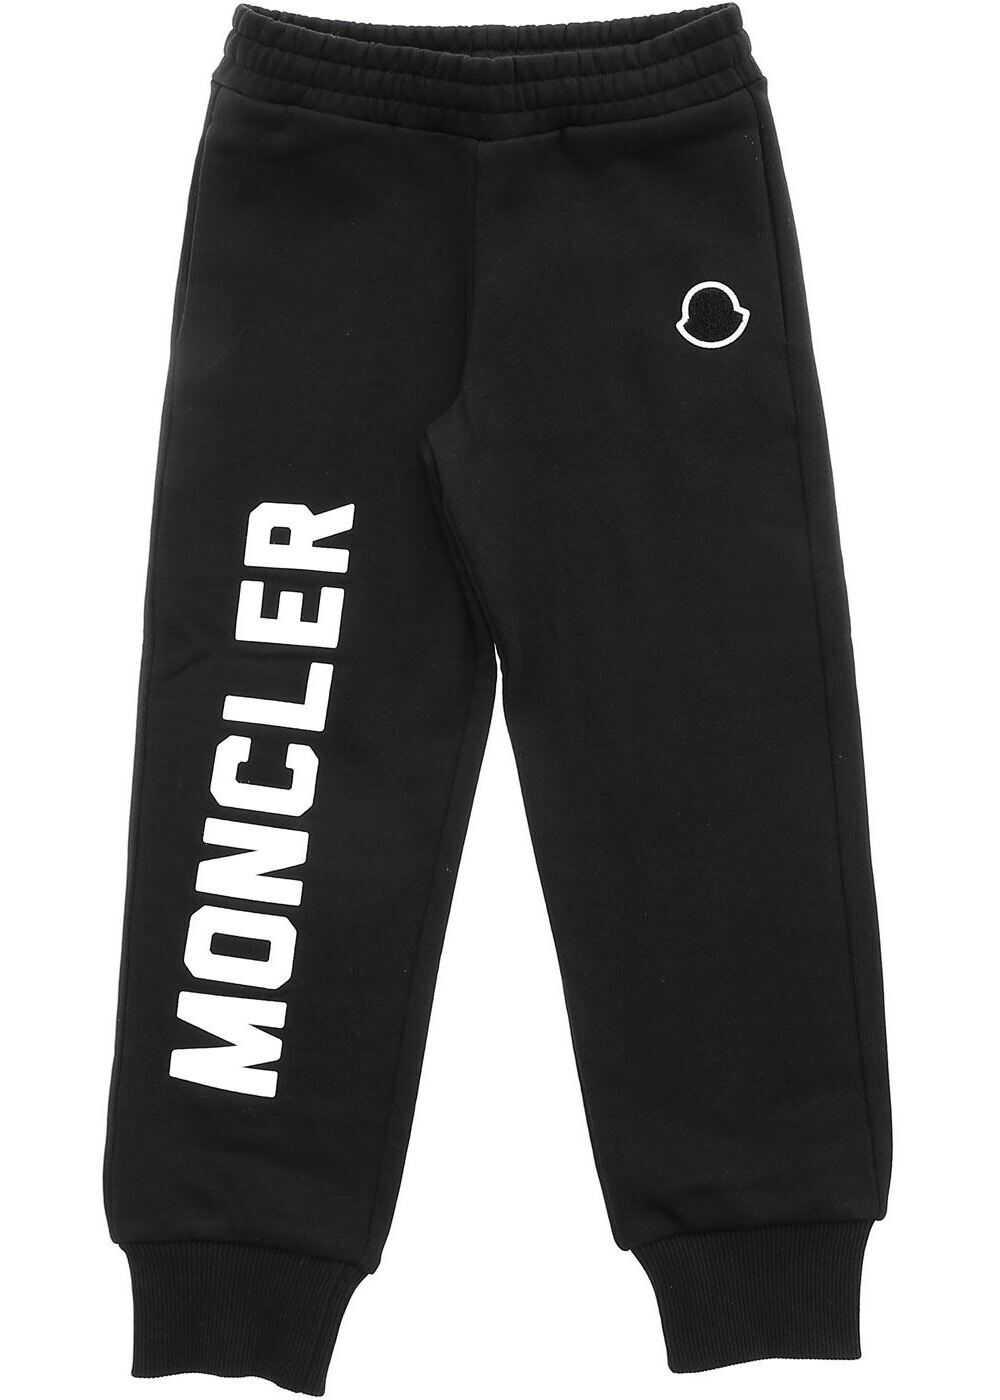 Moncler Kids Black Fleece Trousers Black